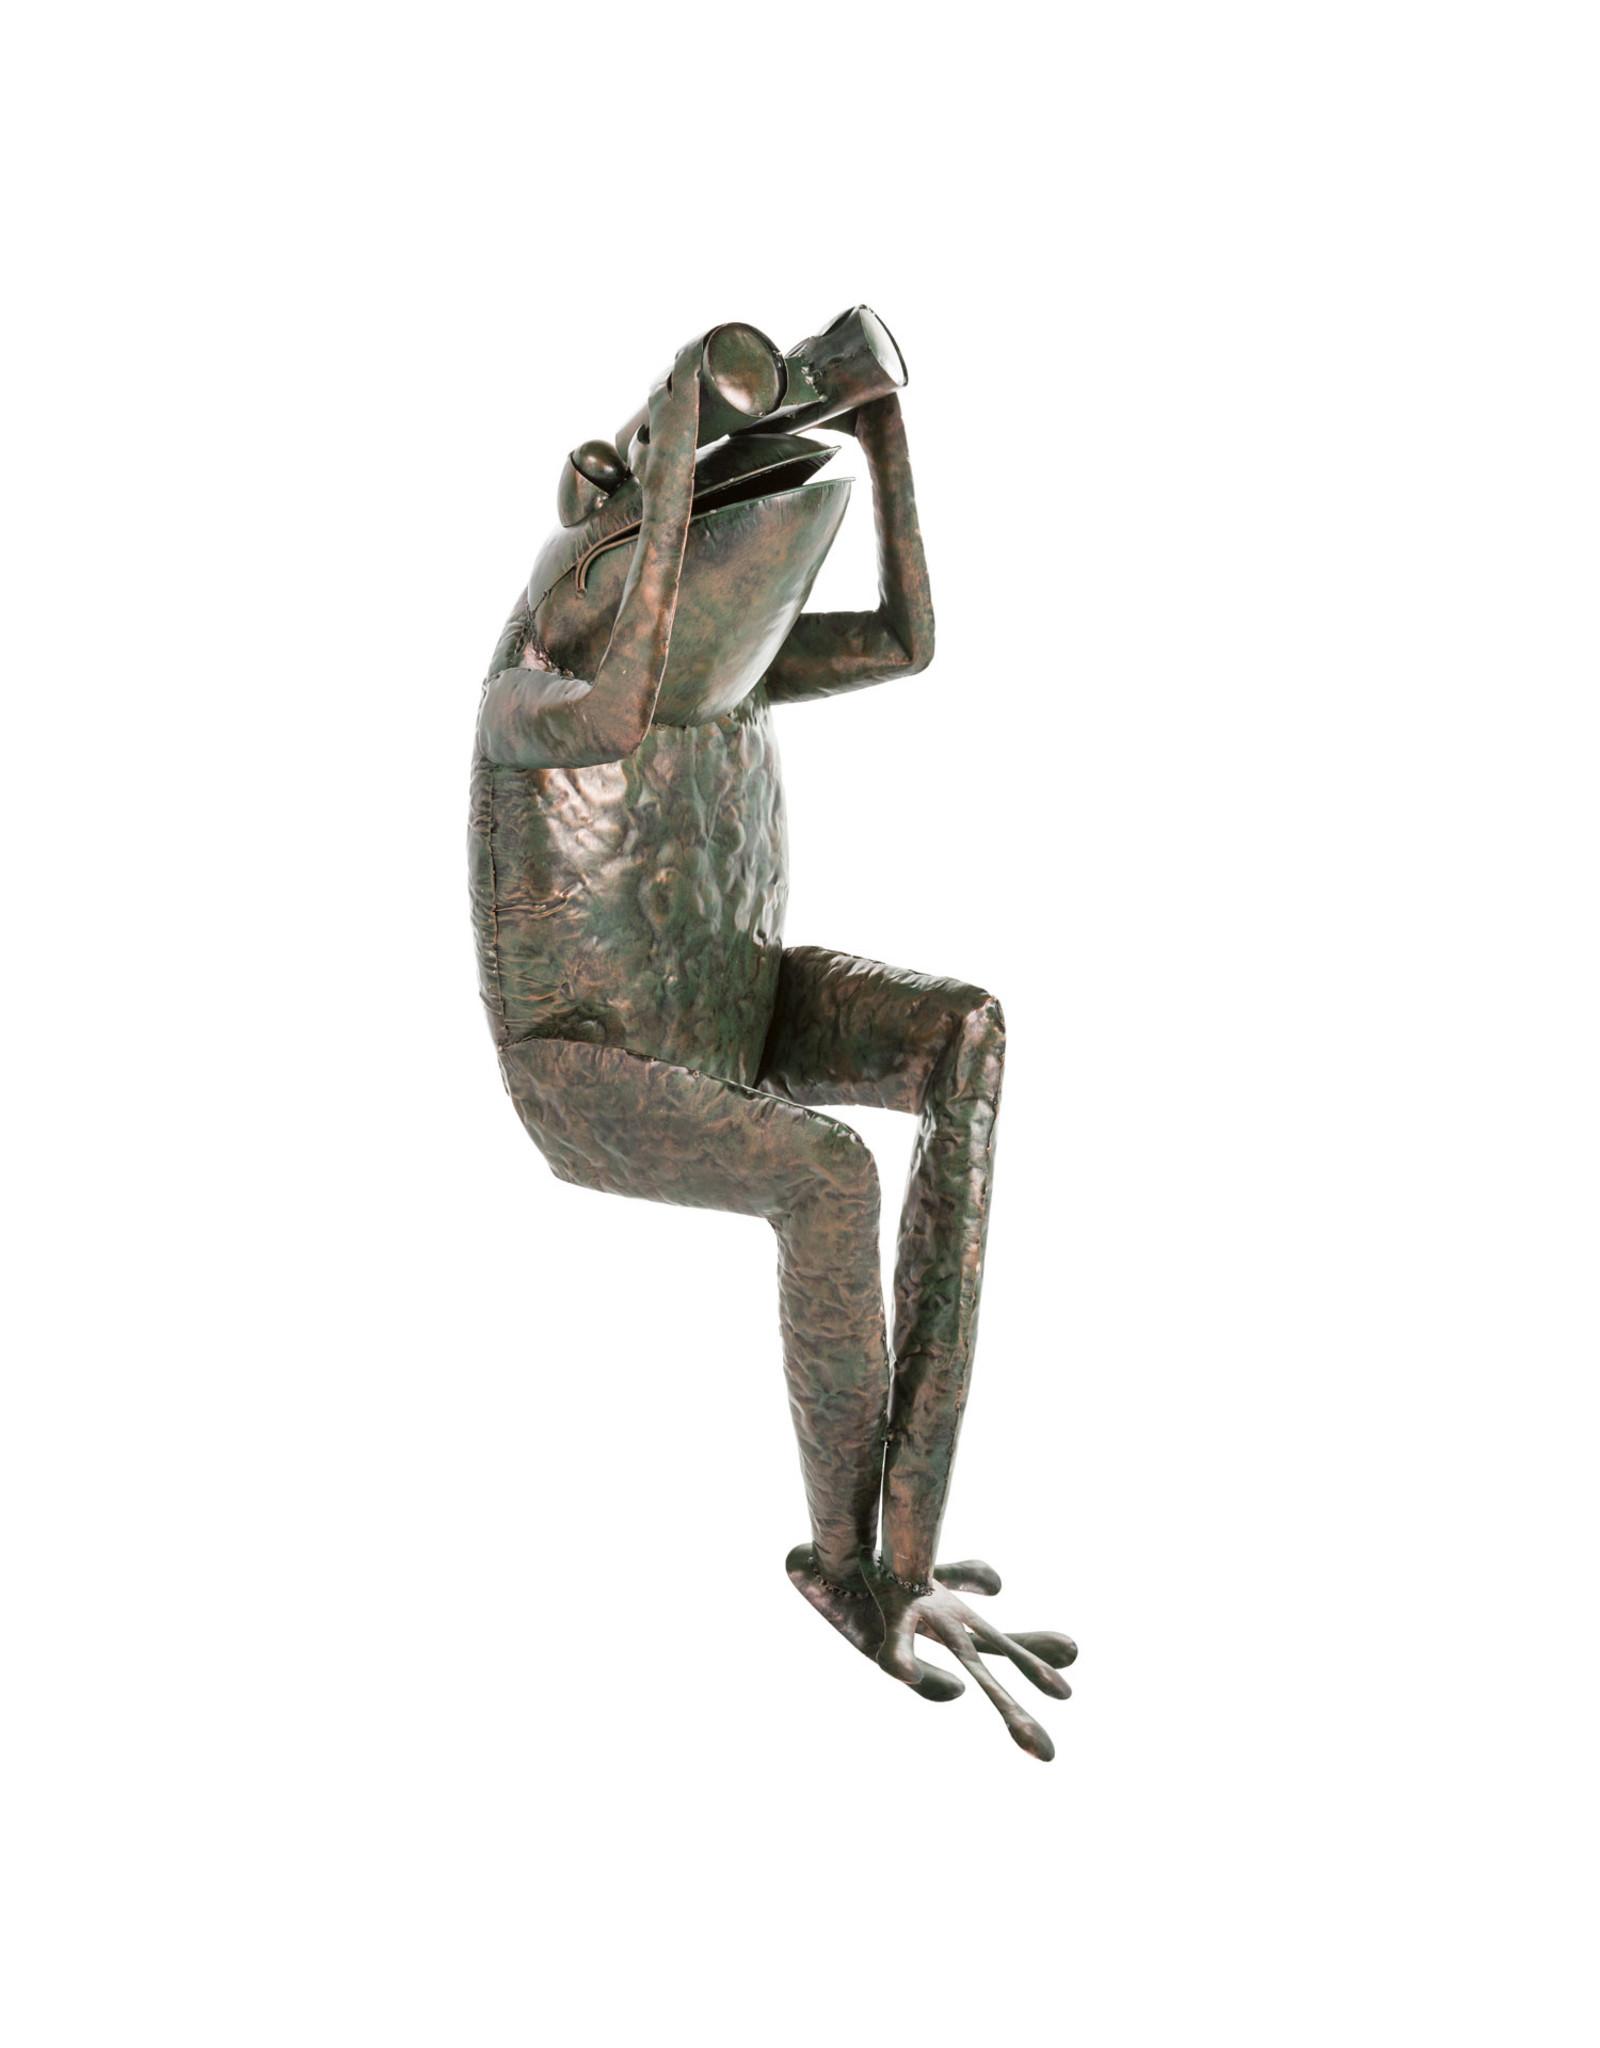 EE3287 Handcrafted Metal Frog with Binoculars